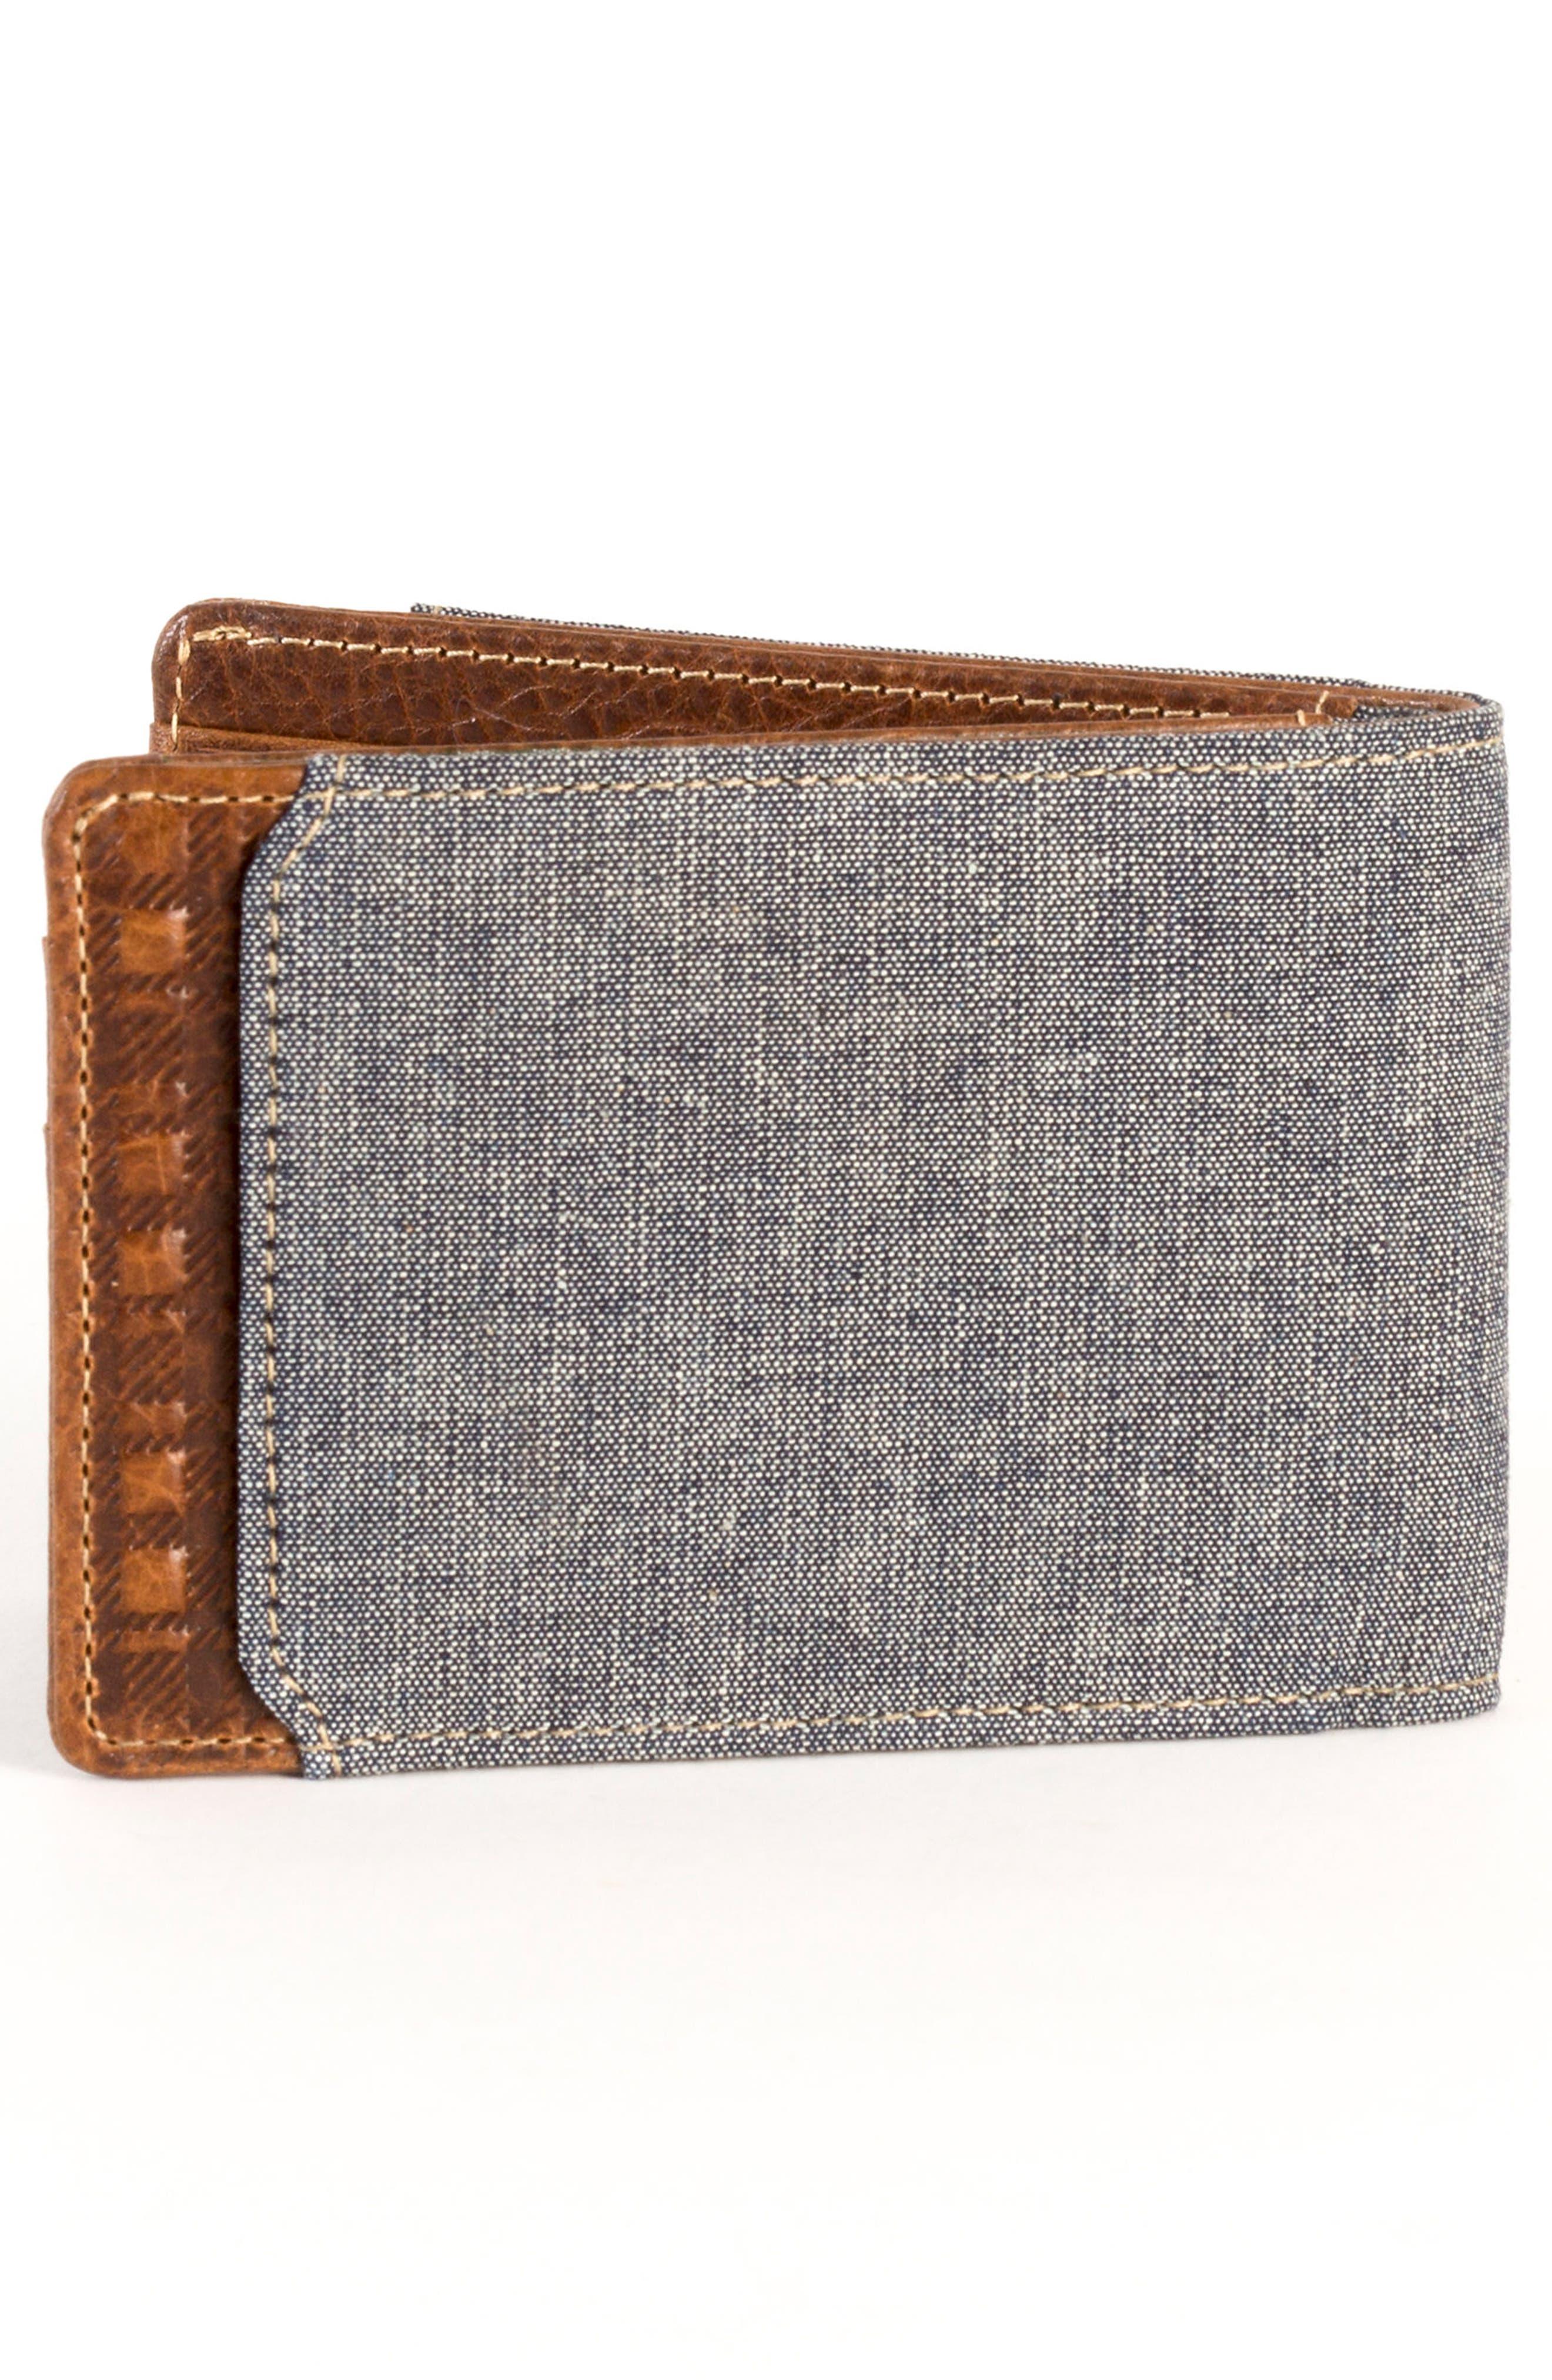 Caleb LTE Wallet,                             Alternate thumbnail 3, color,                             210